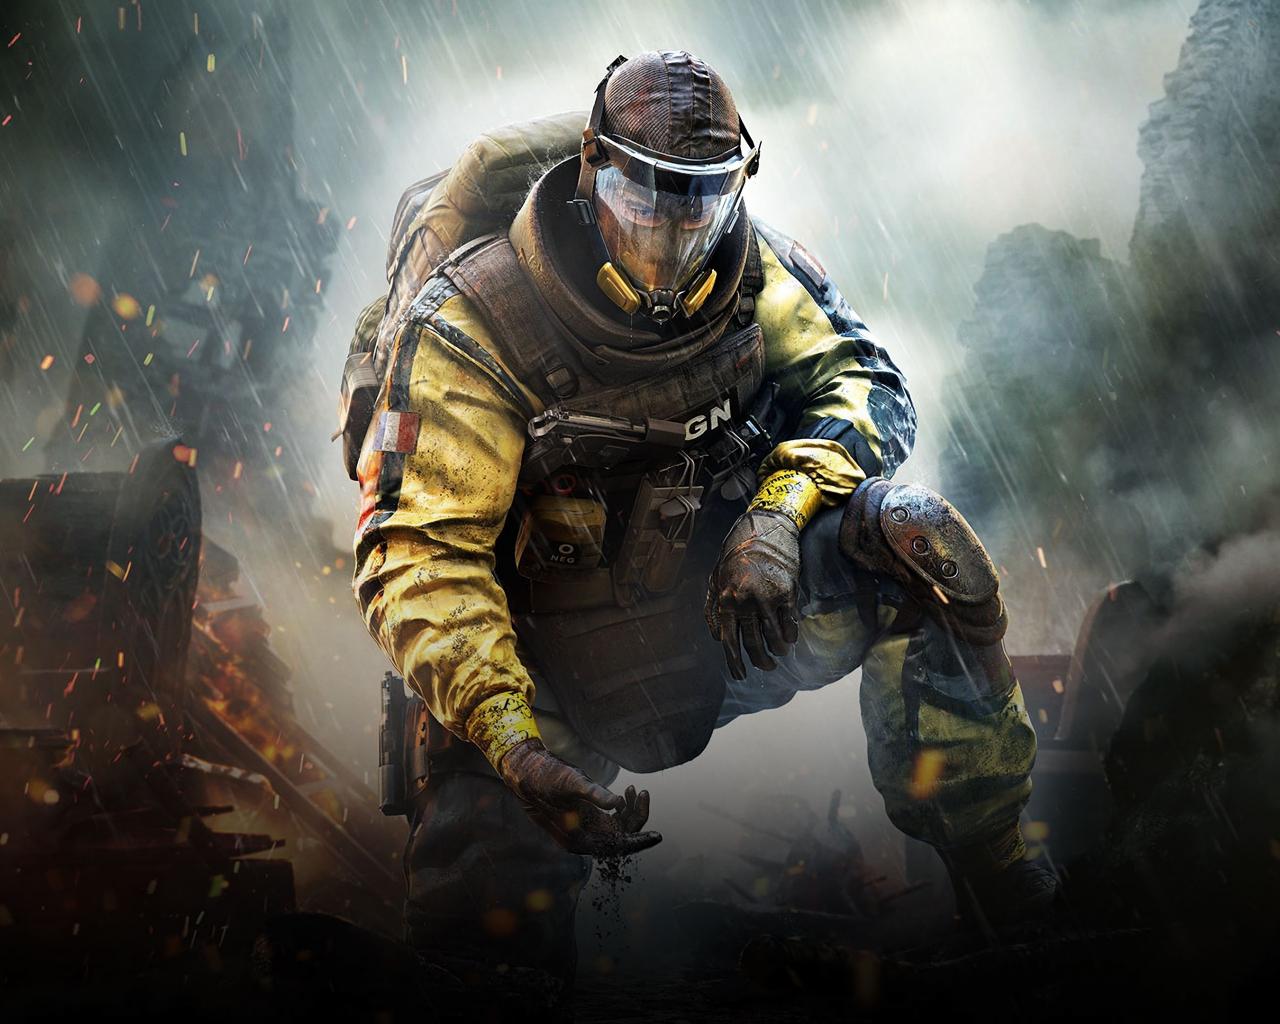 Video Game Gas Mask Tom Clancys Rainbow Six Siege Soldier 1280x1024 Wallpaper